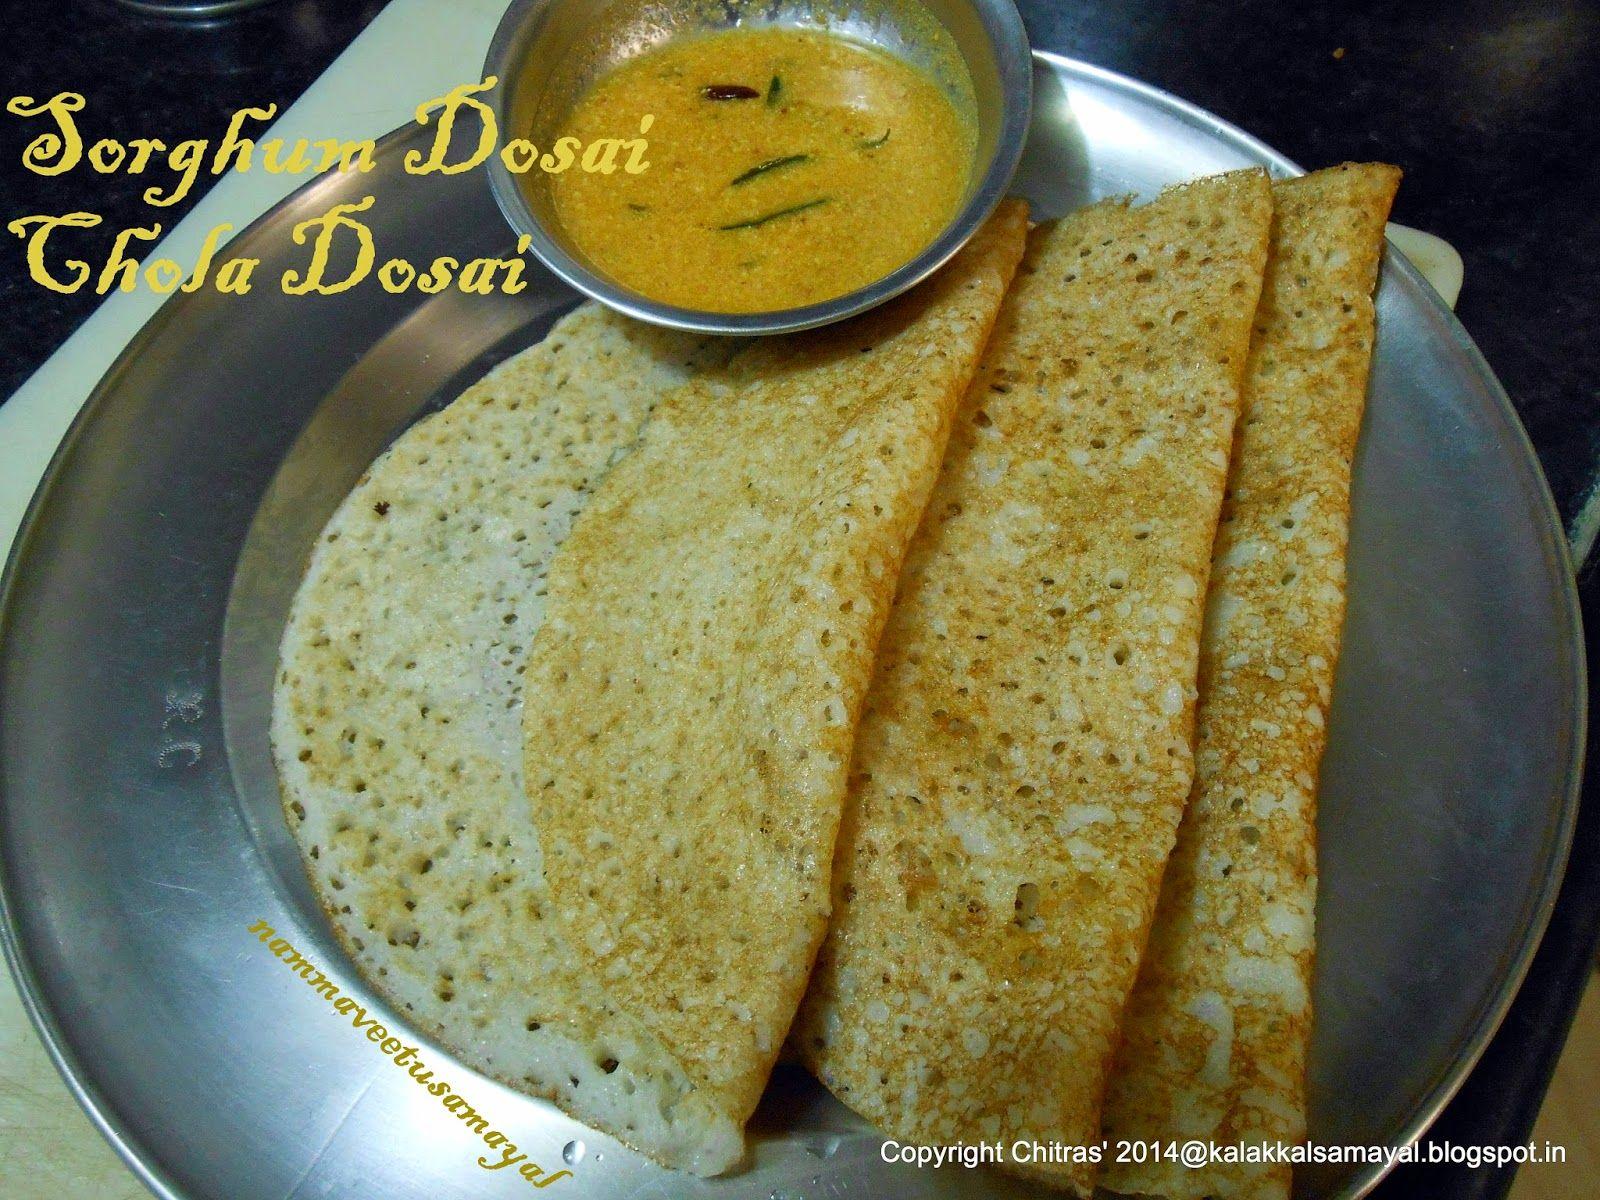 Cholam dosai 1 sorghum jowar dosai 1 indian recipes cholam dosai 1 sorghum jowar dosai 1 forumfinder Images